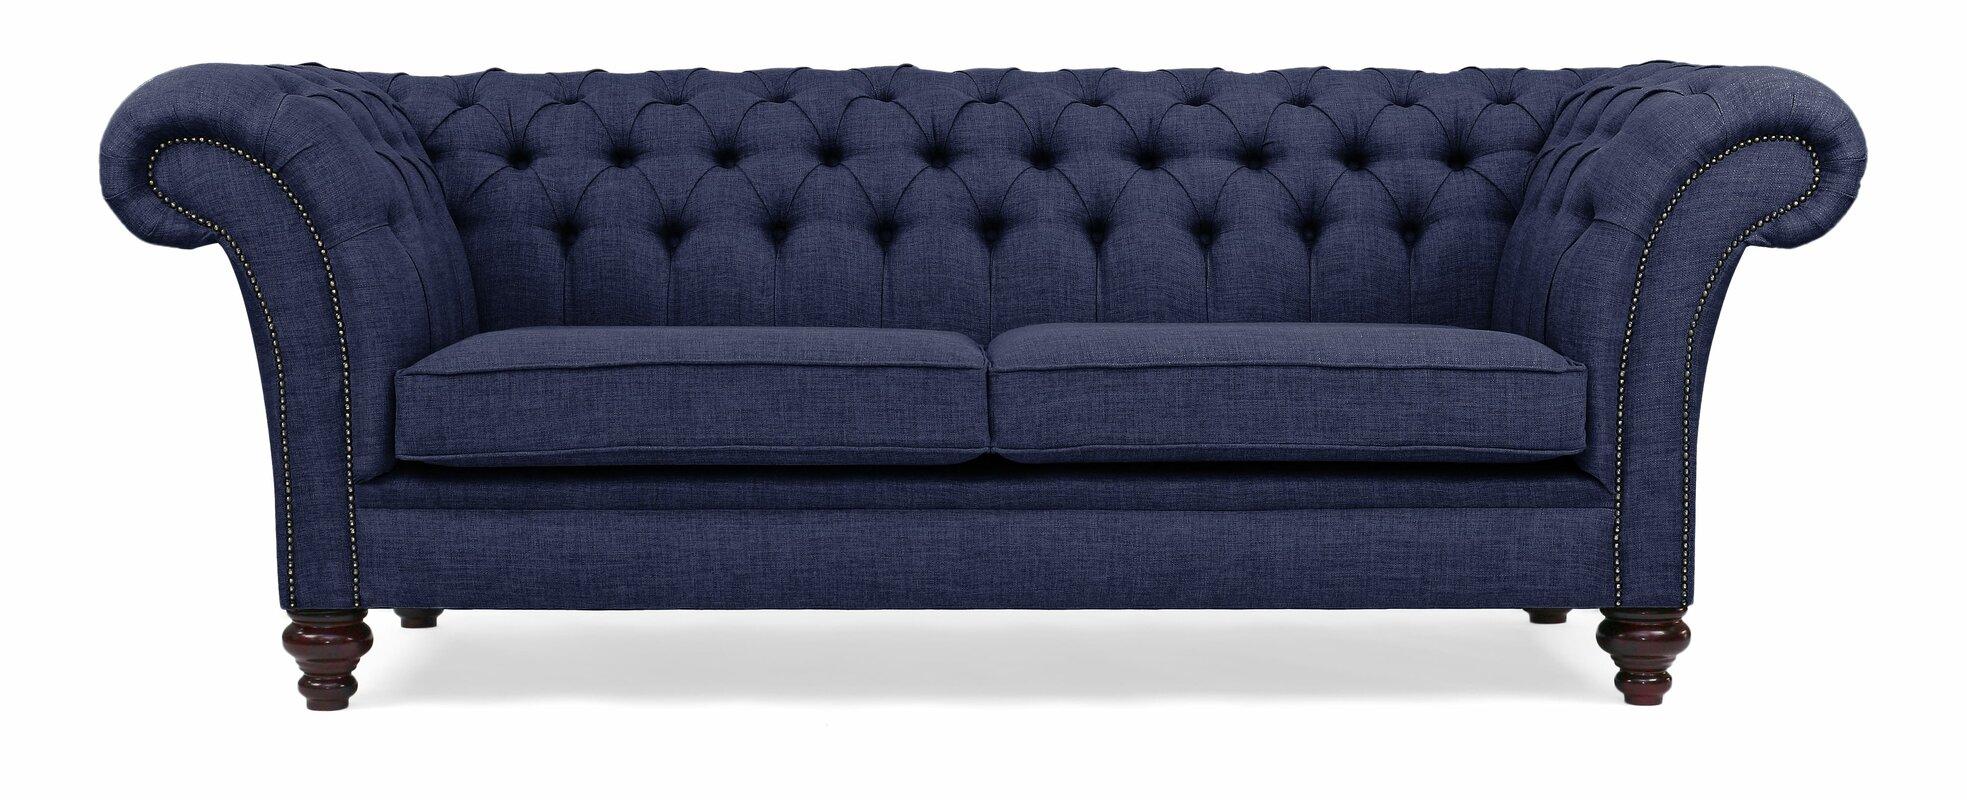 portabello interiors 4 sitzer sofa milano. Black Bedroom Furniture Sets. Home Design Ideas